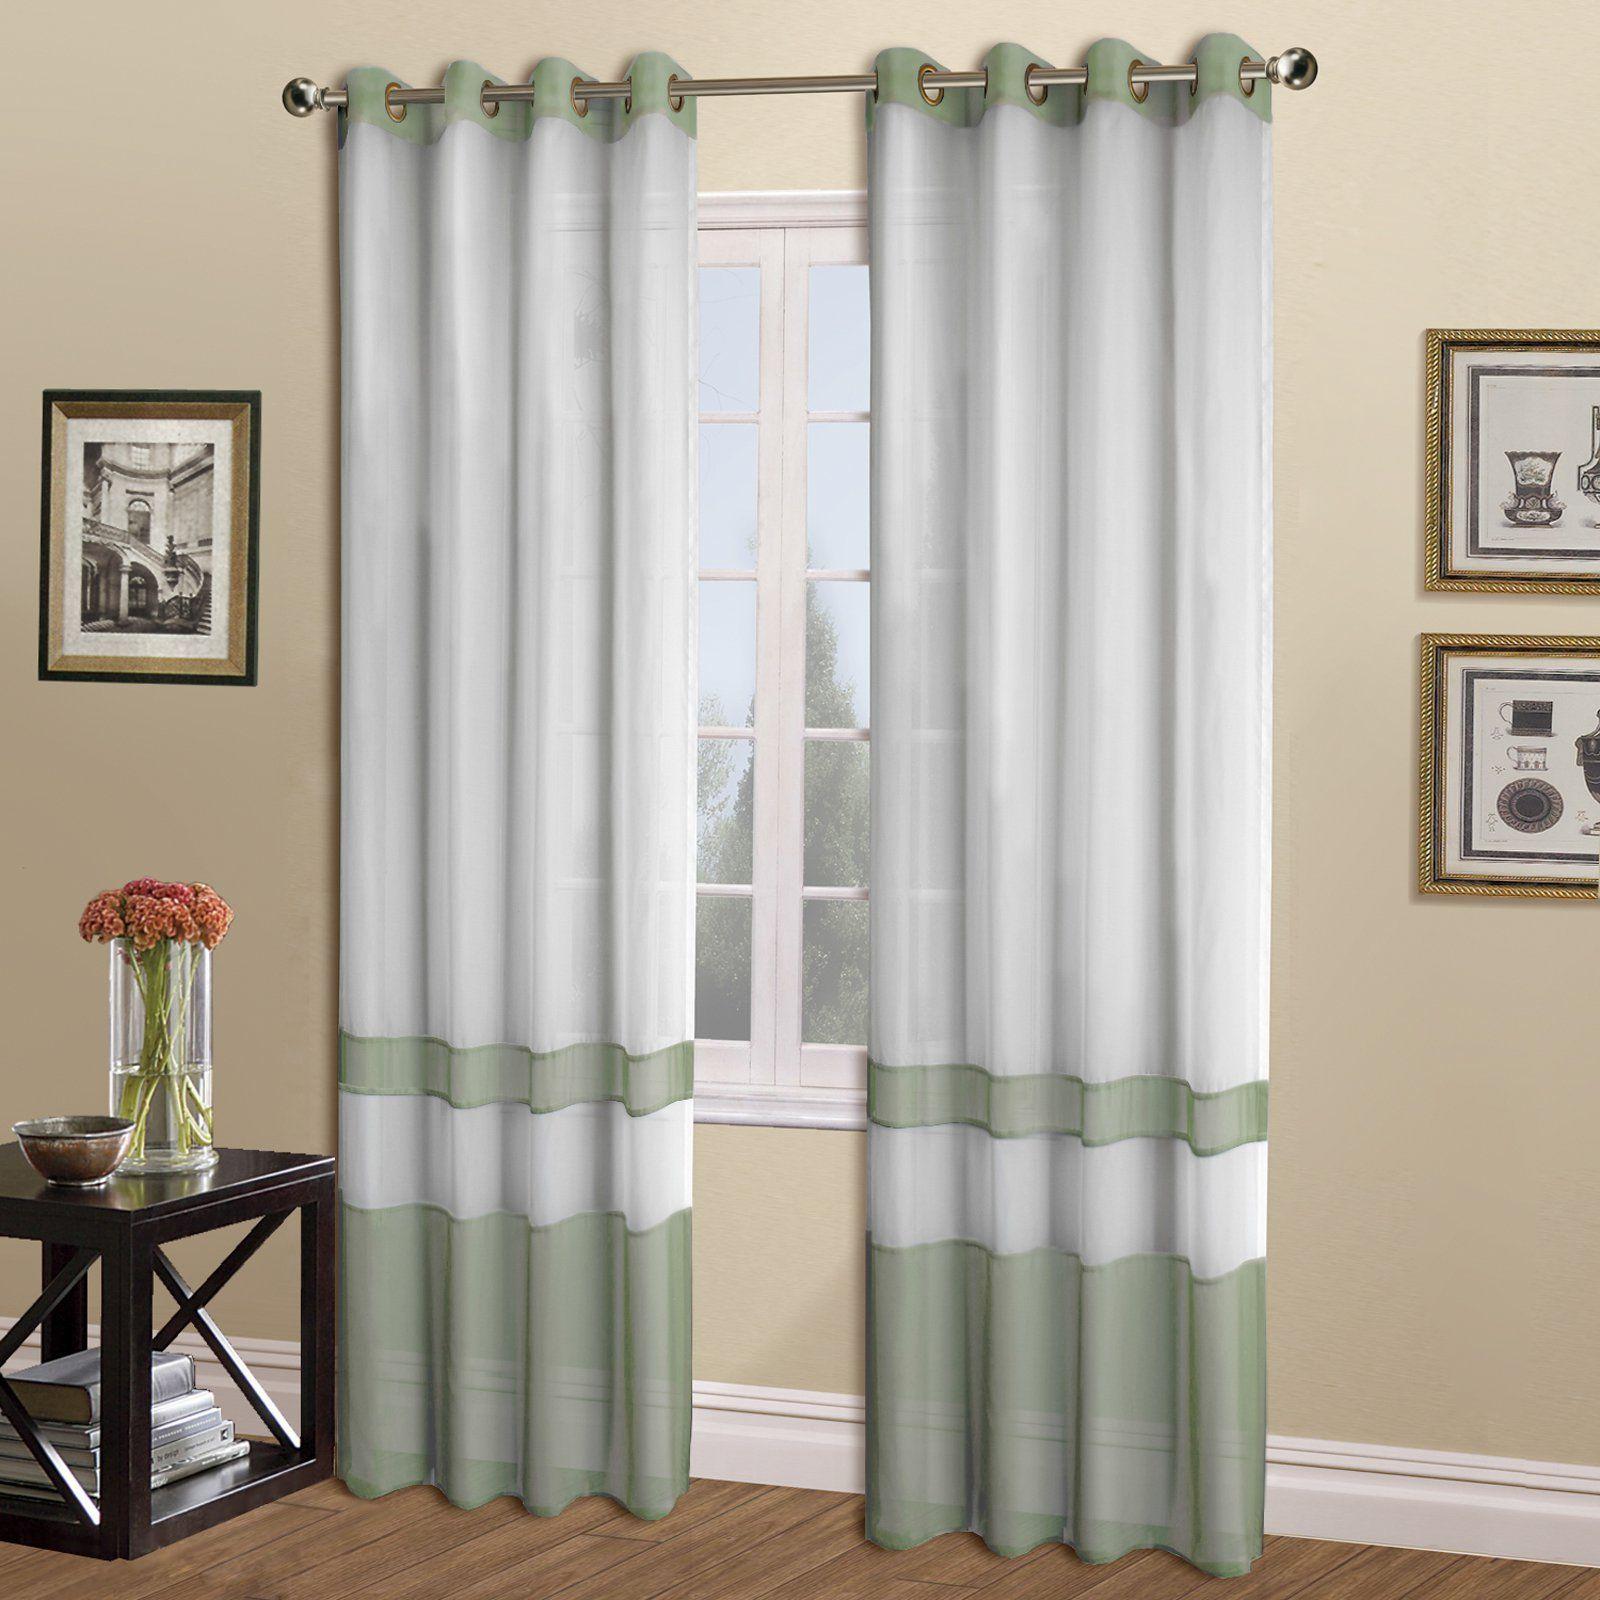 United Curtain Milan Curtain Panel Sage Curtains Panel Curtains